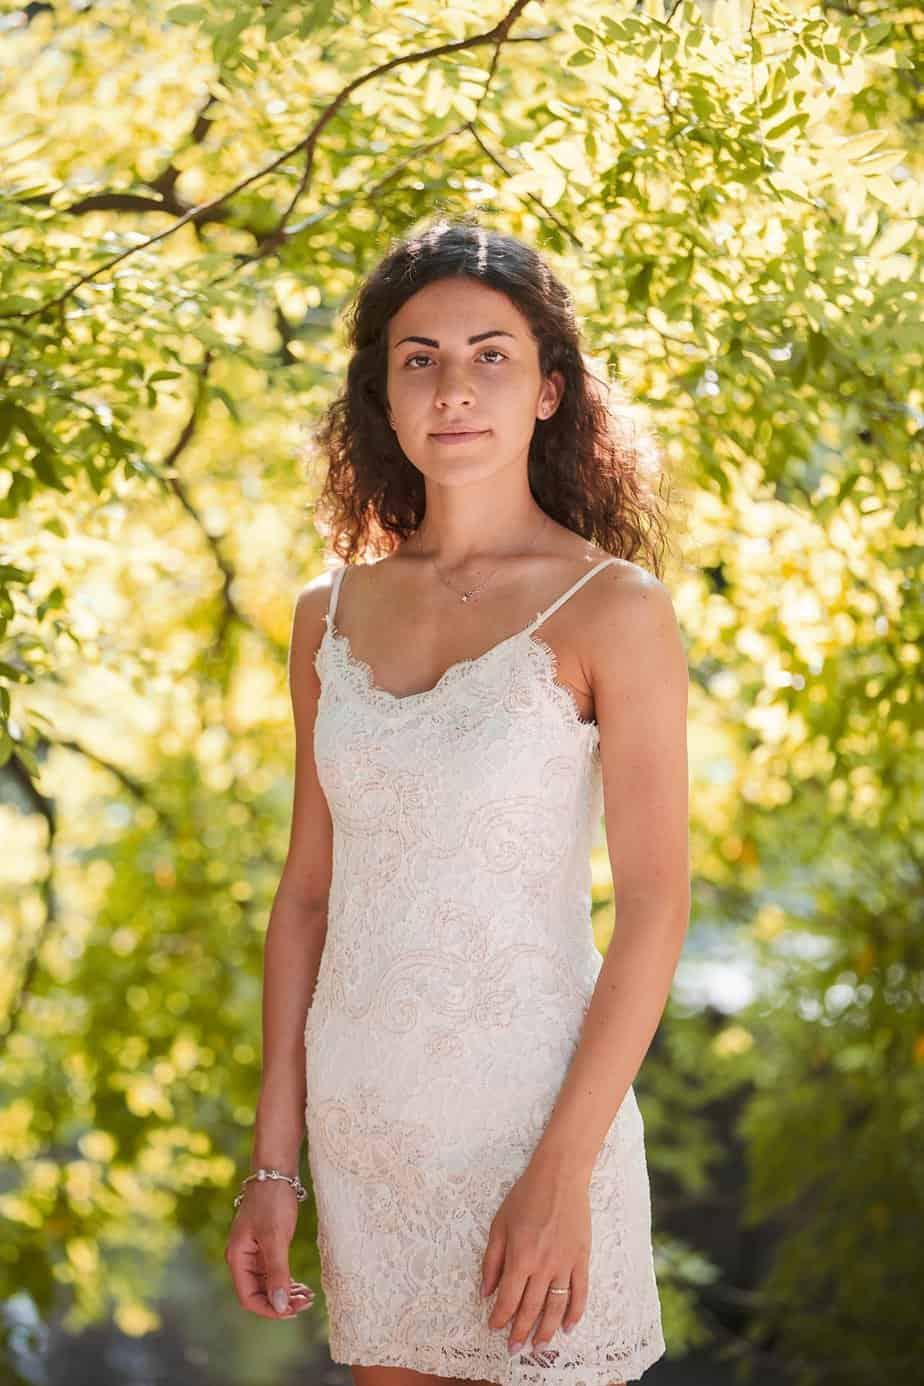 giada_fashionshooting_portrait_FrancescaBandiera